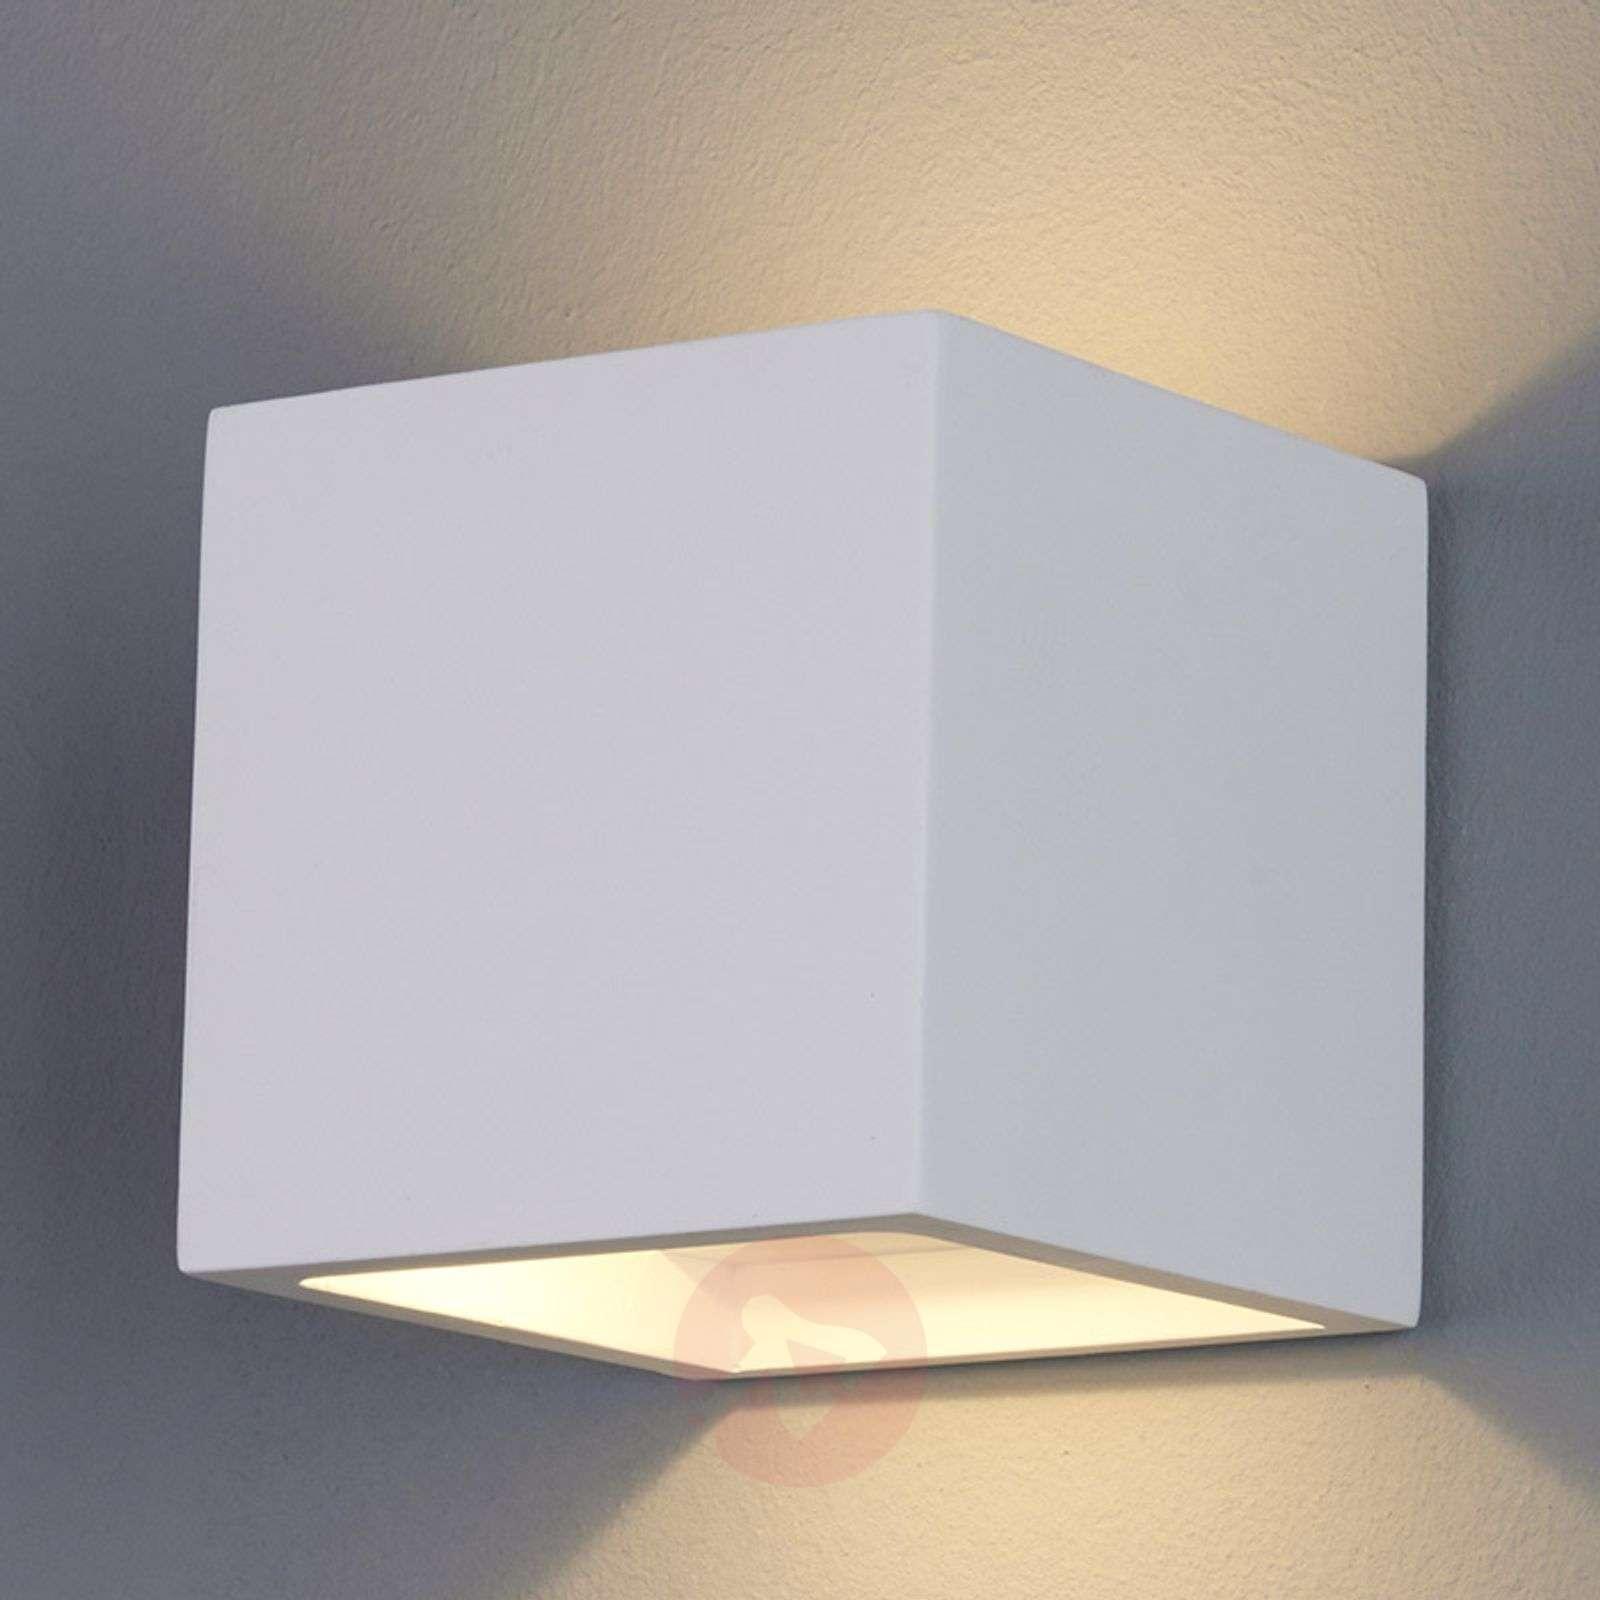 Marita LED Wall Light Cube-Shaped Plaster-9613038-01